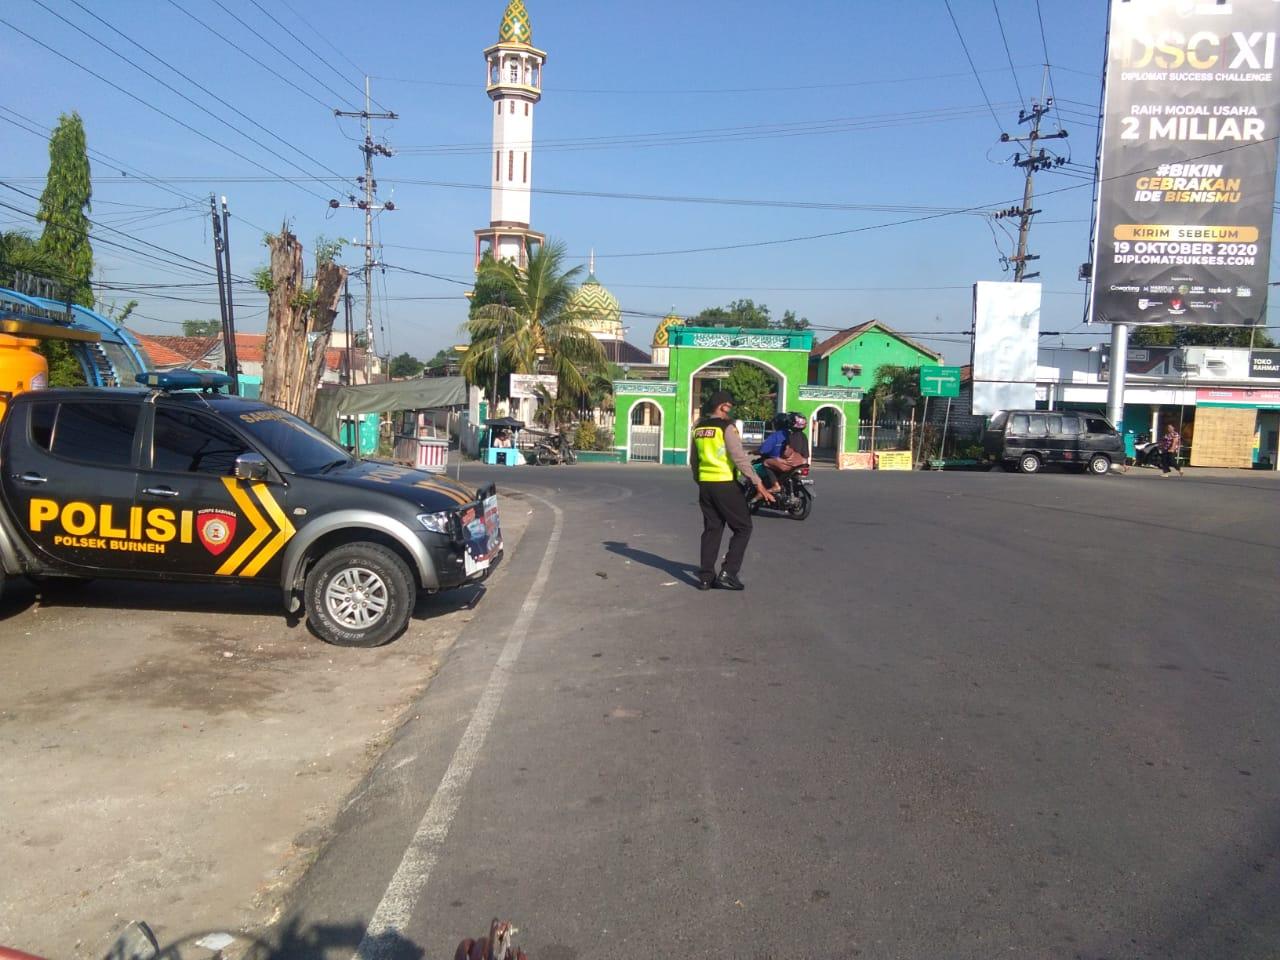 Pengamanan PengaturanArus Lalu Lintas Pagi Oleh Anggota Polsek Burneh